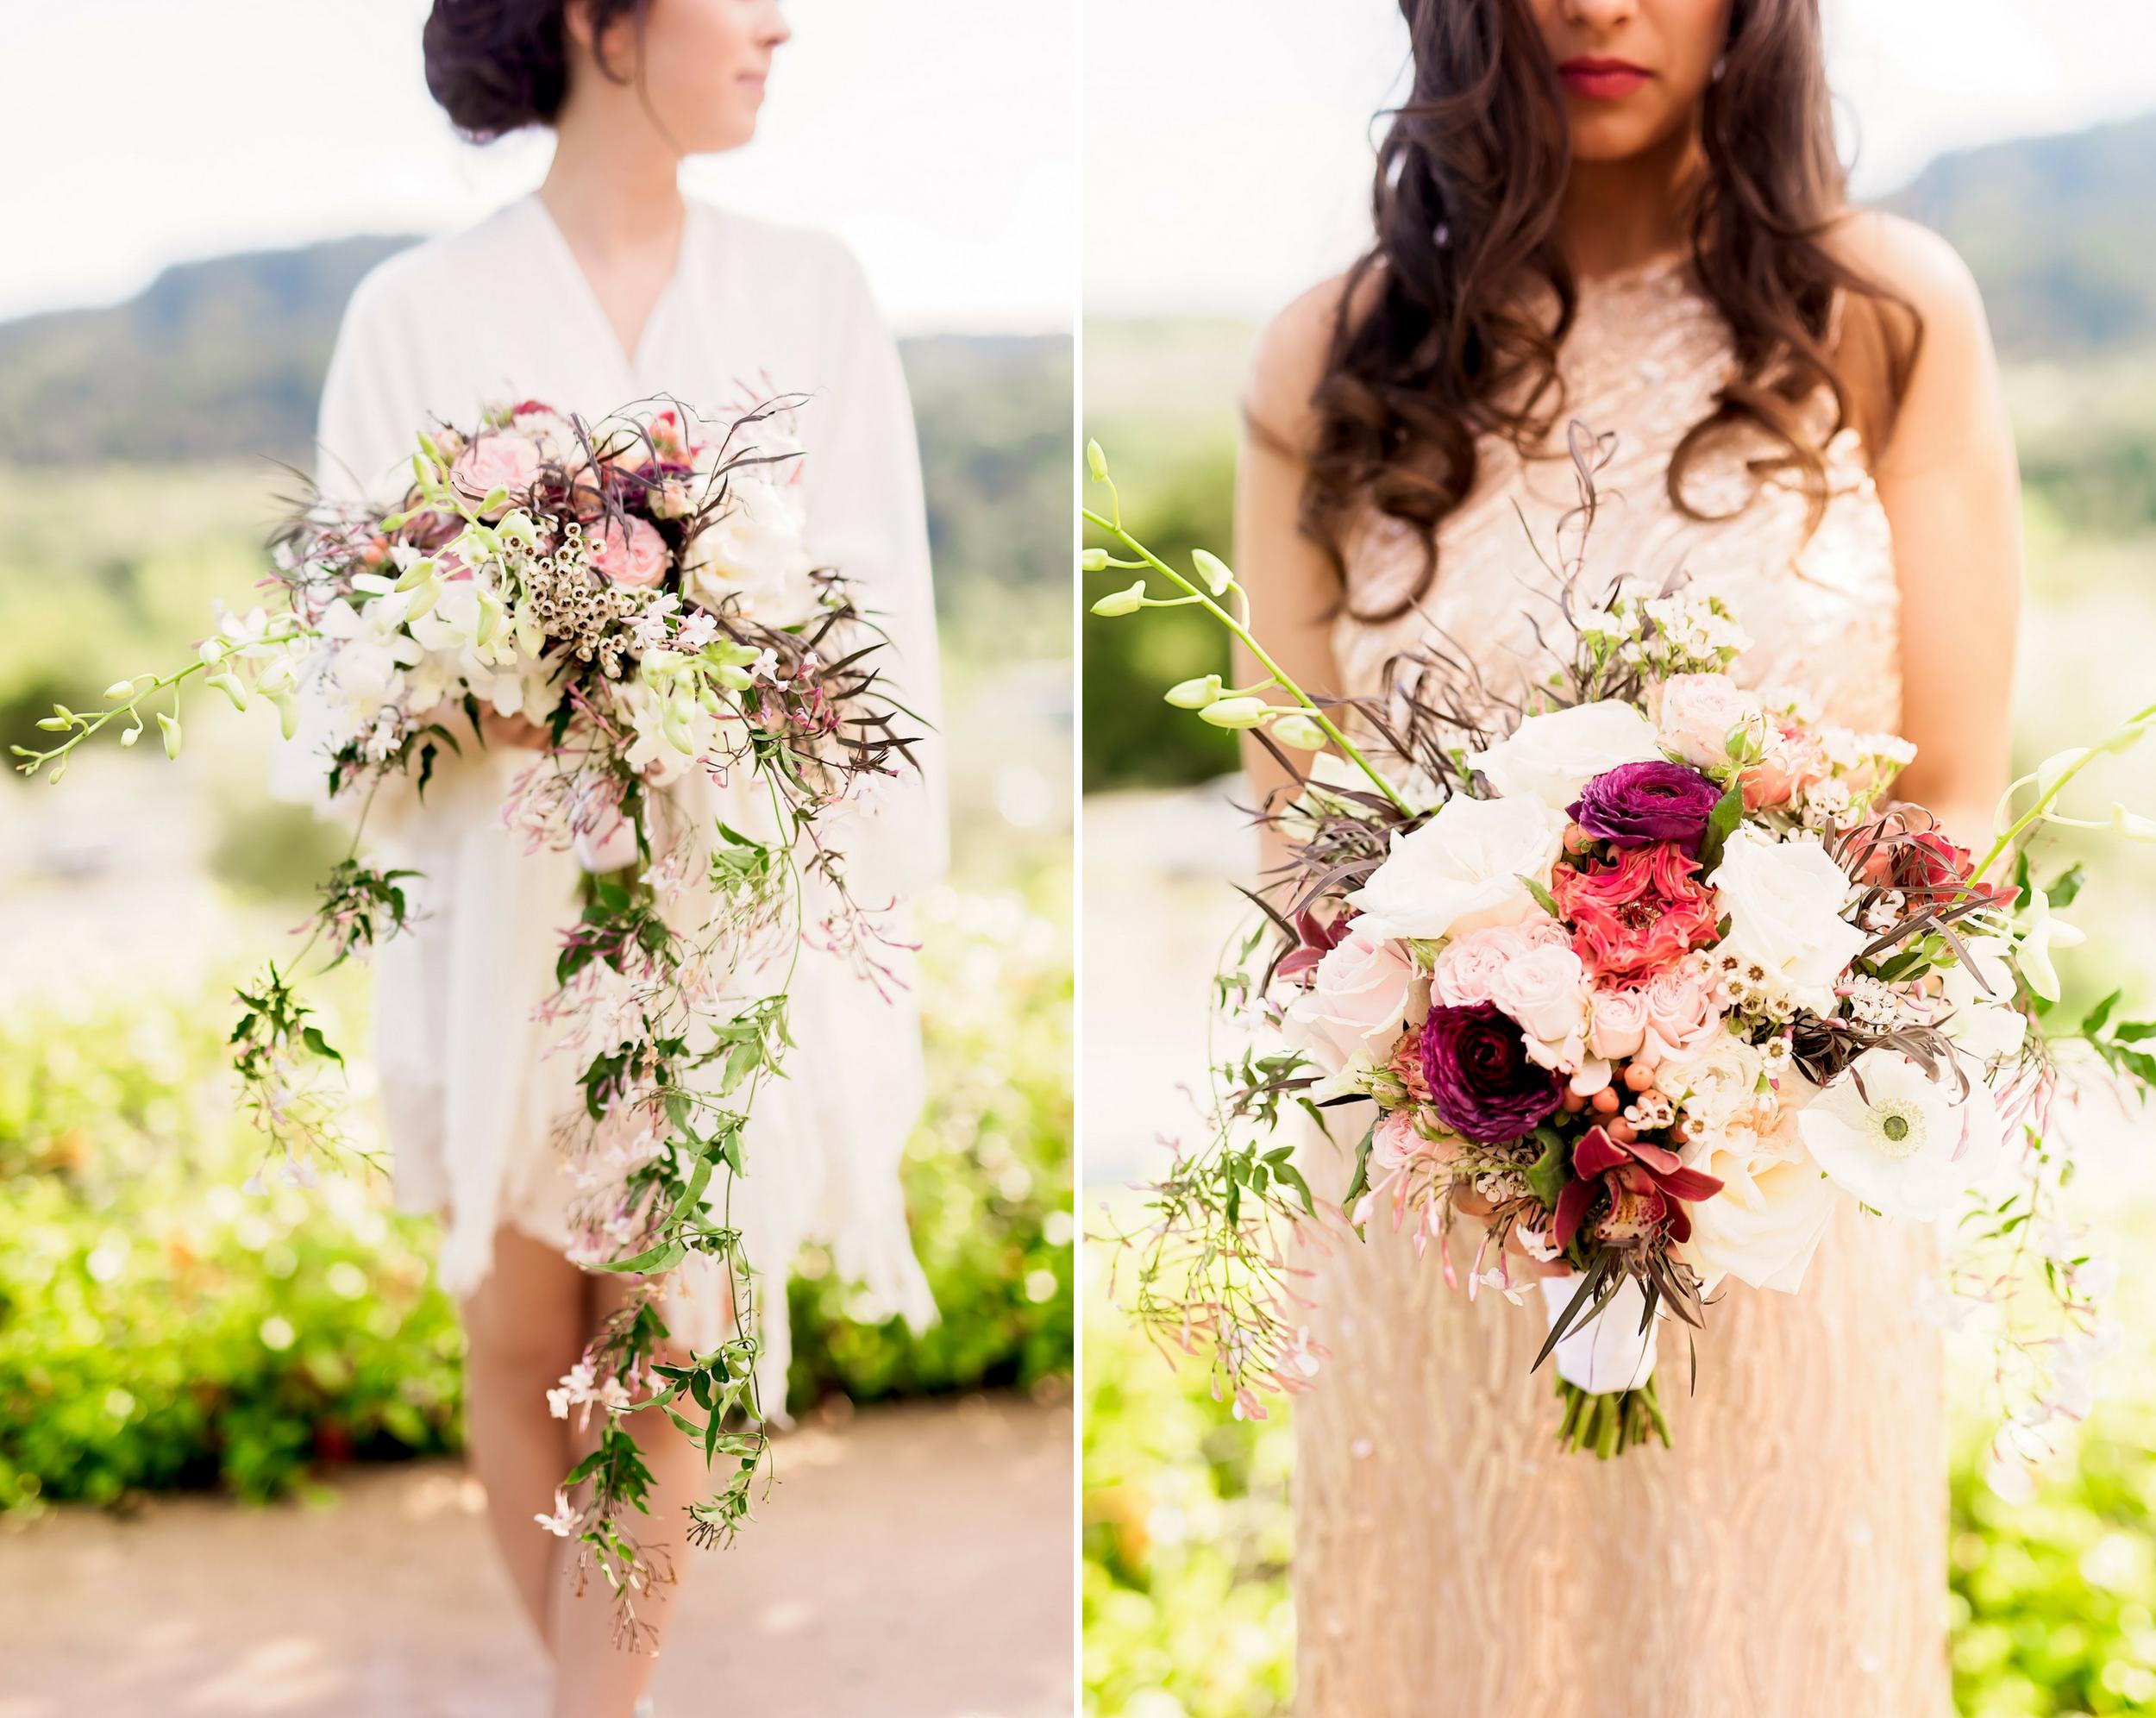 Rachel-Sergio-Wedding-Pharris-Photos-5.jpg